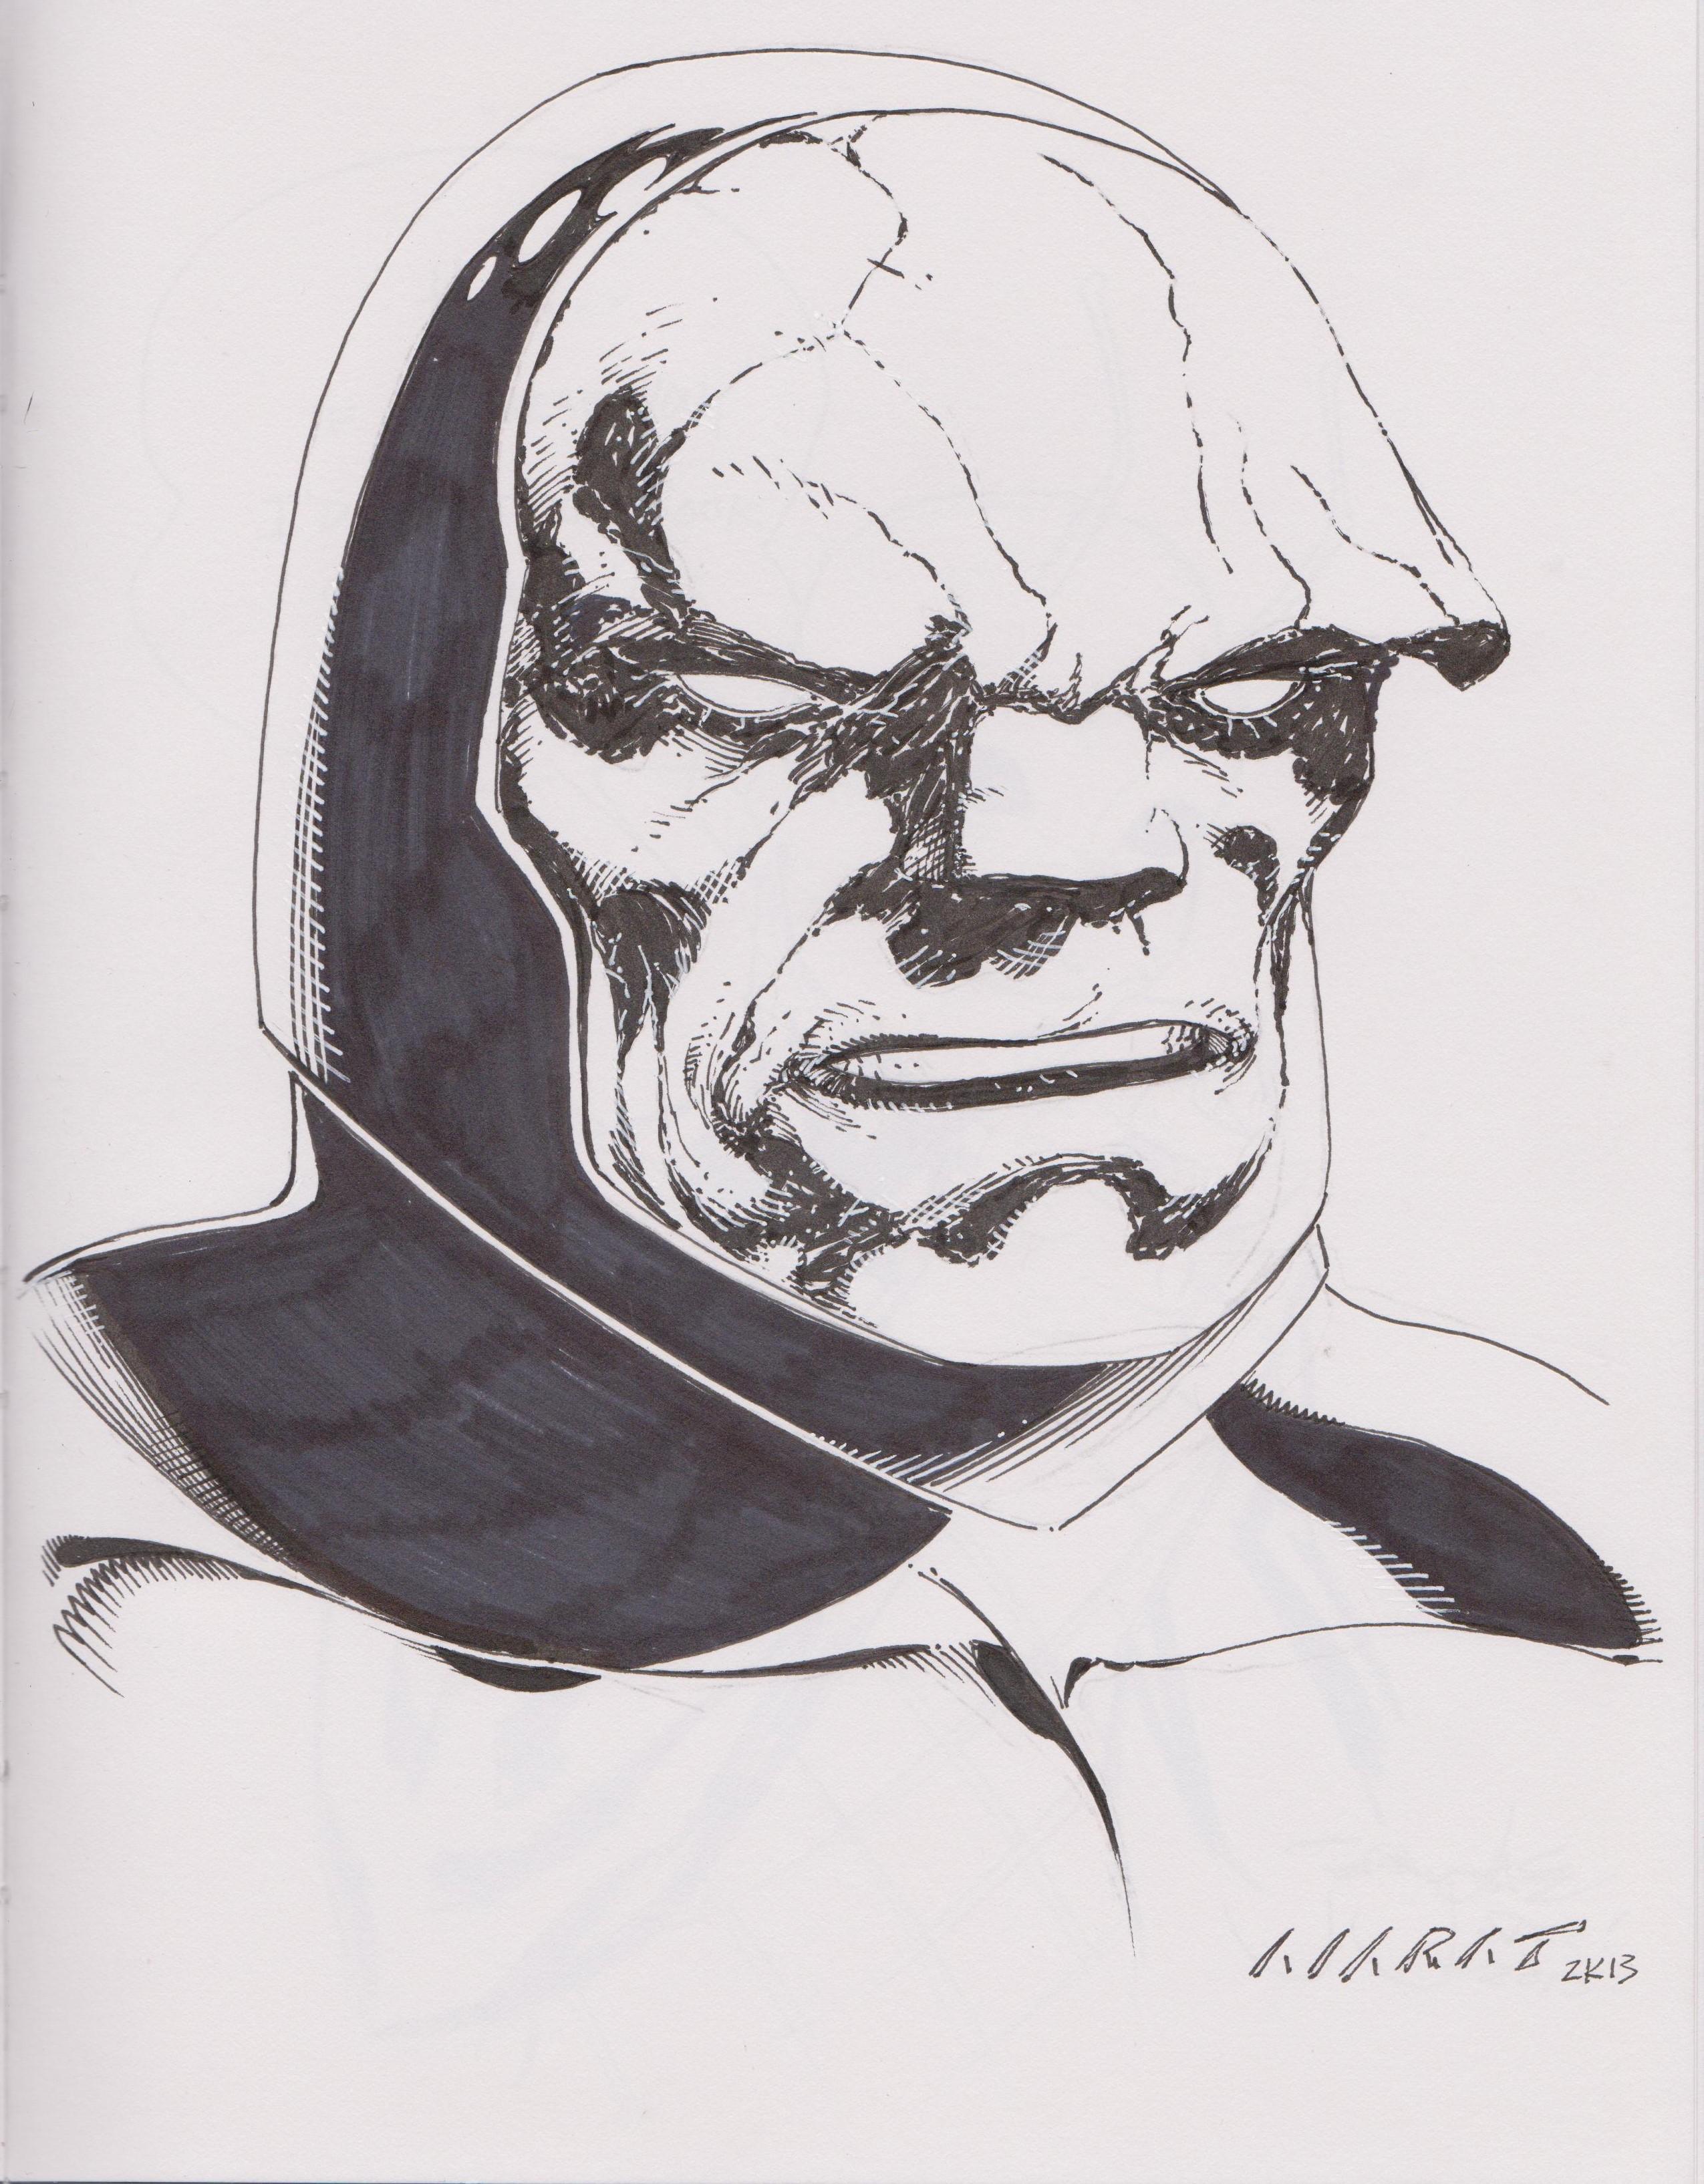 Darkseid by Marat Mychaels